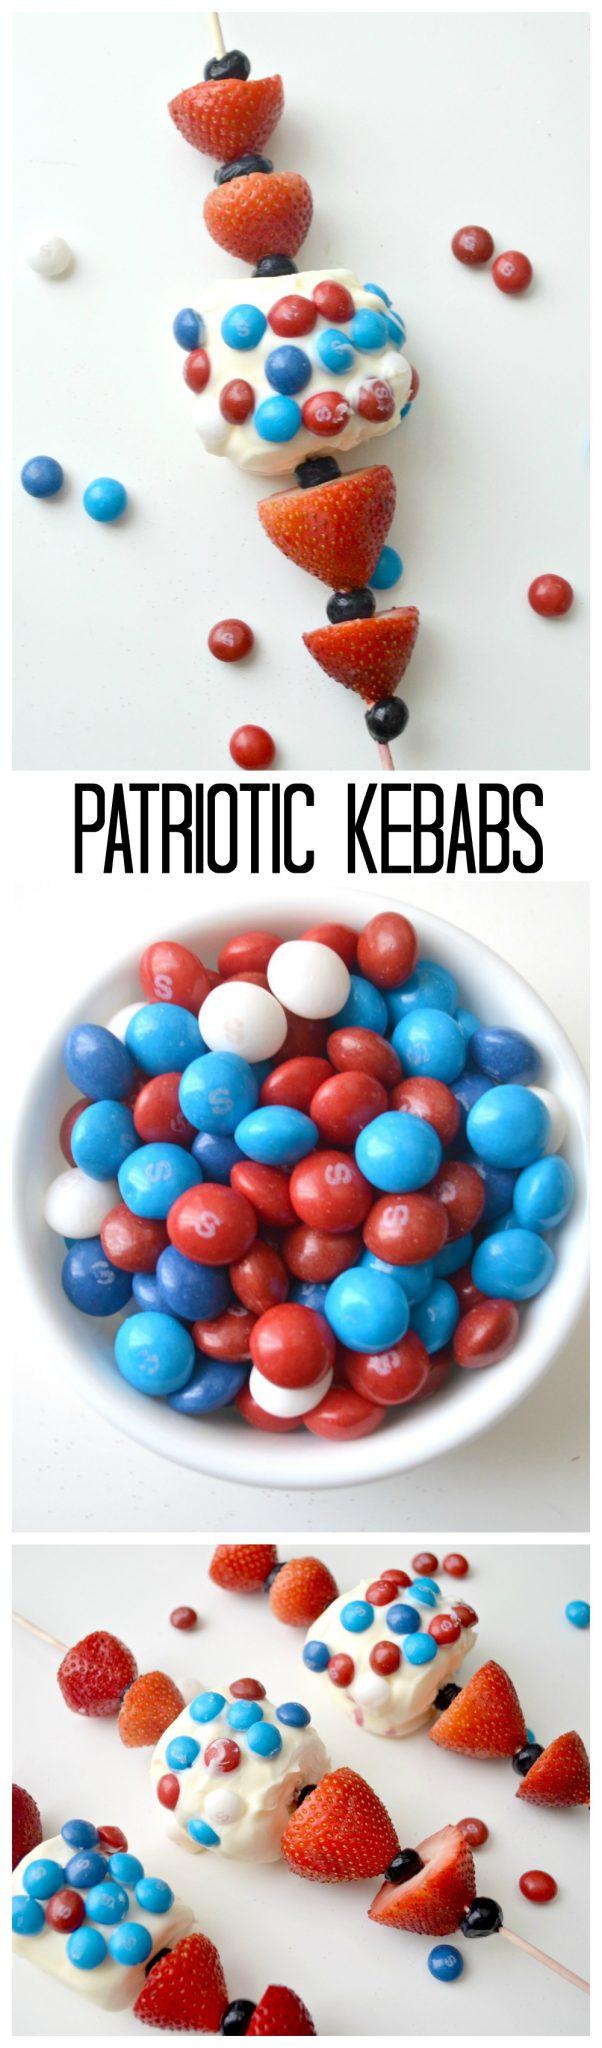 Patriotic Kebabs Dessert Idea